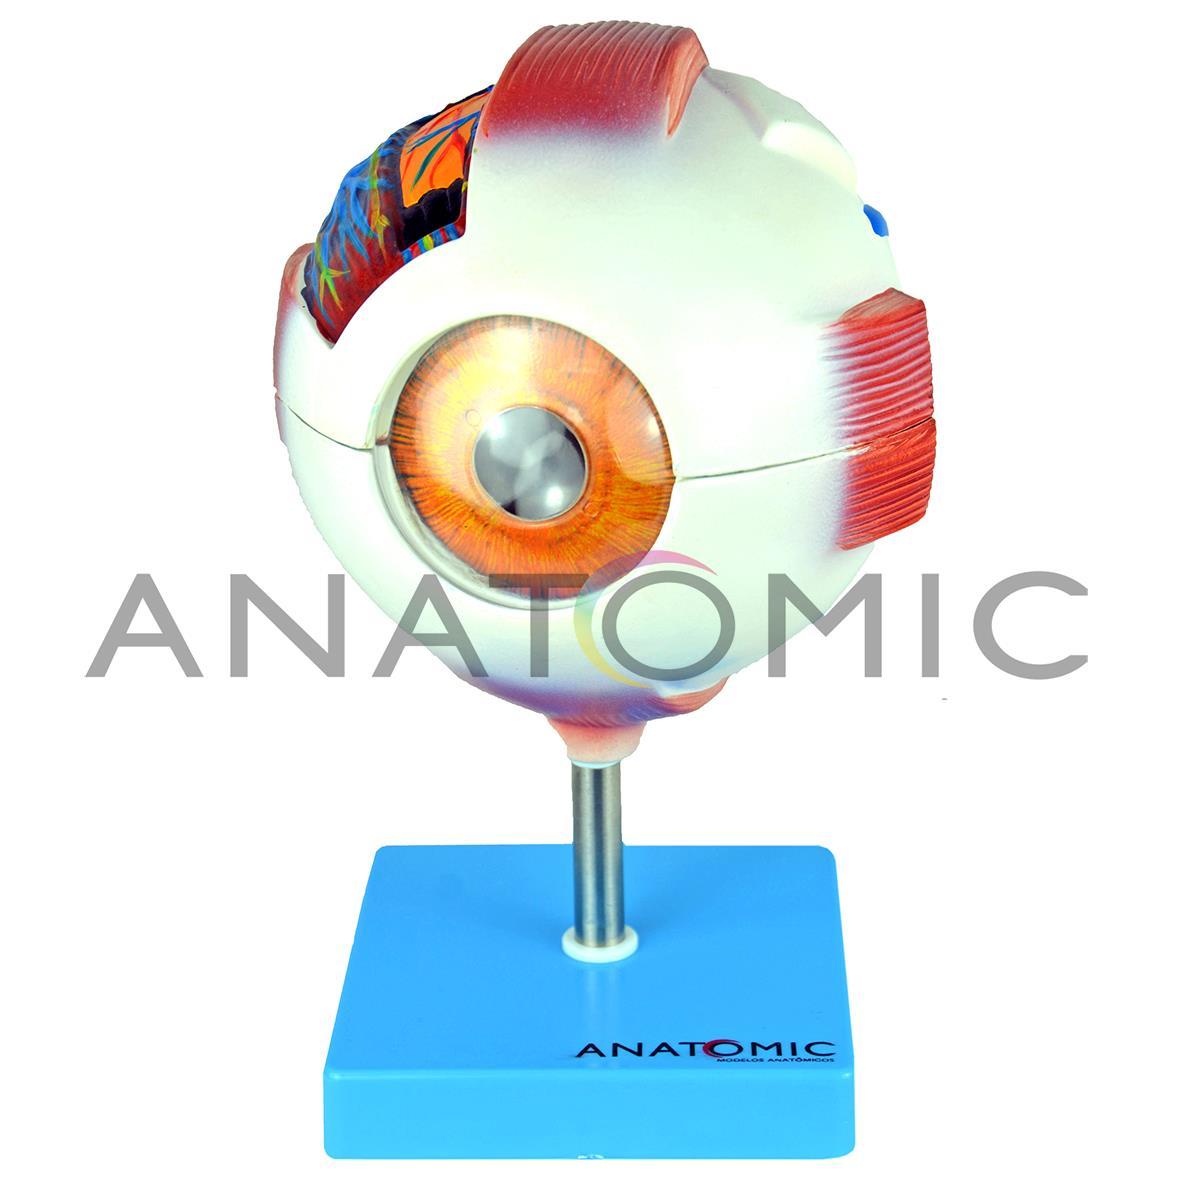 ANATOMIA DO OLHO EM 8 PARTES TGD-0307 - ANATOMIC